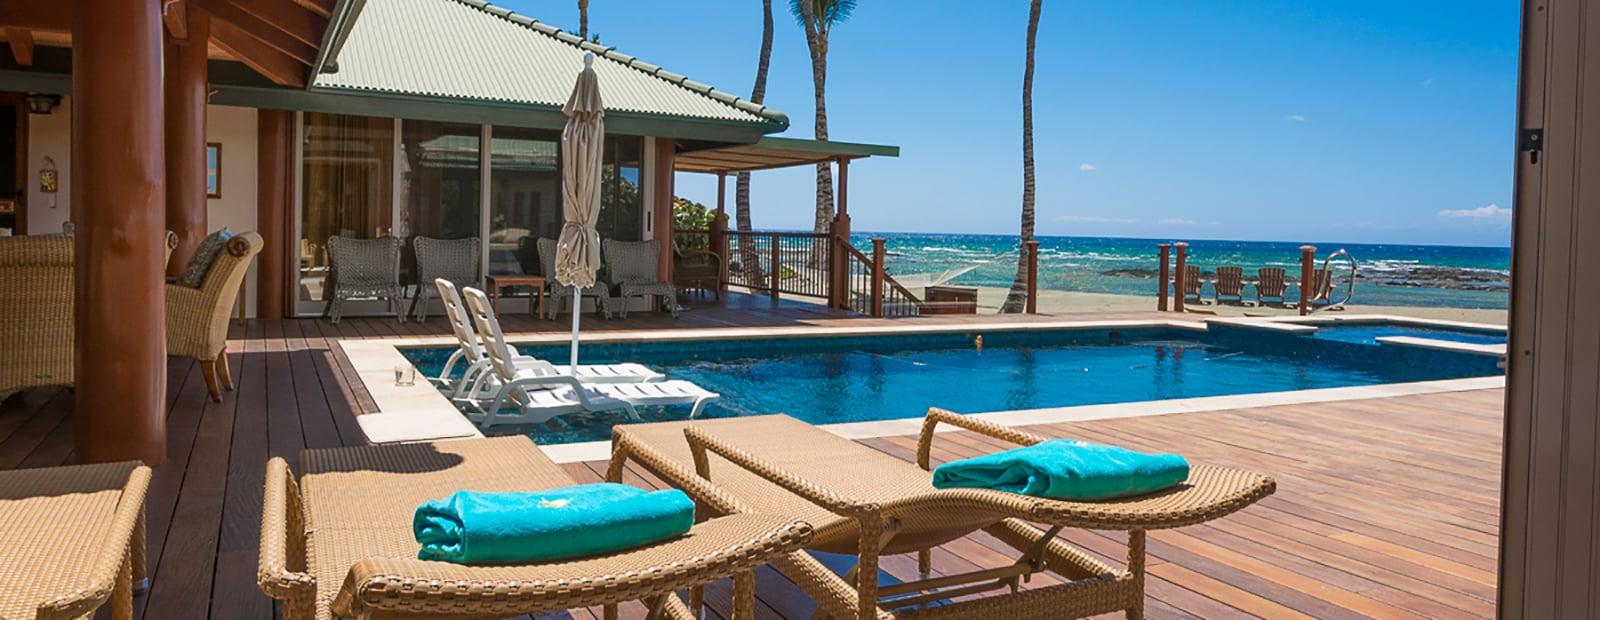 Hawaii_BigIsland_Villa-Puako-Hylton-2017-38